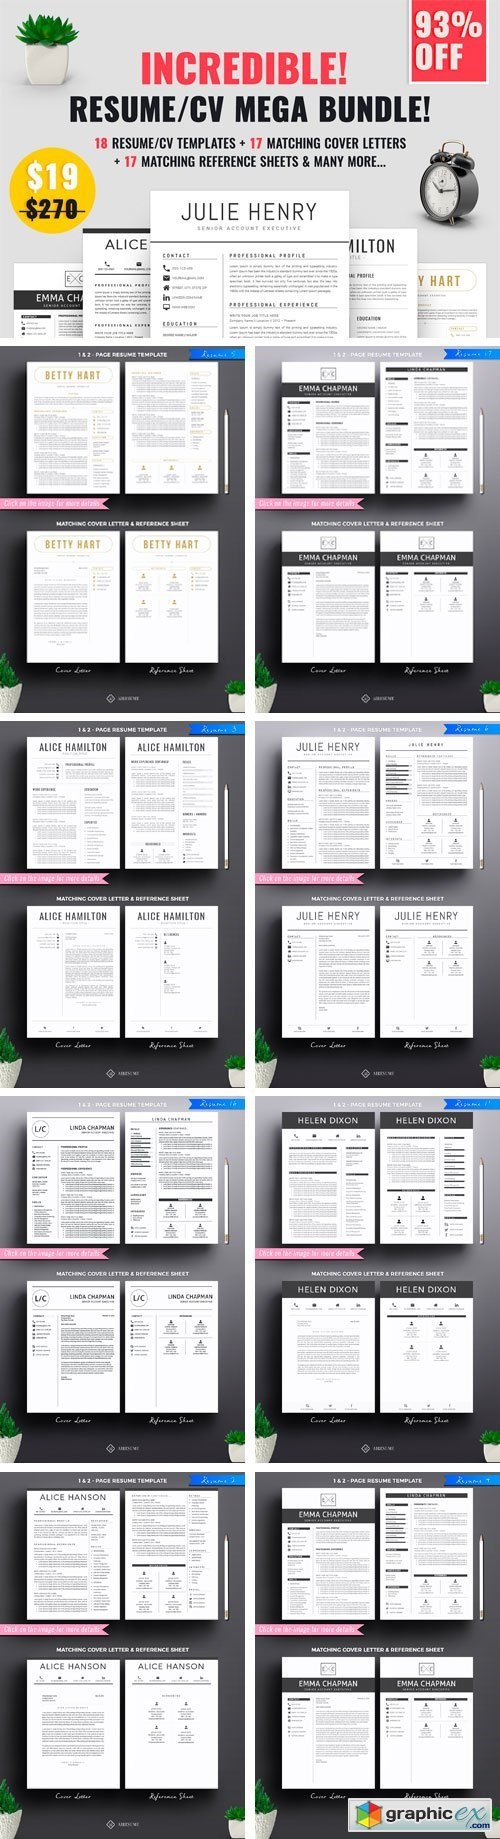 resume  cv mega bundle  u00bb free download vector stock image